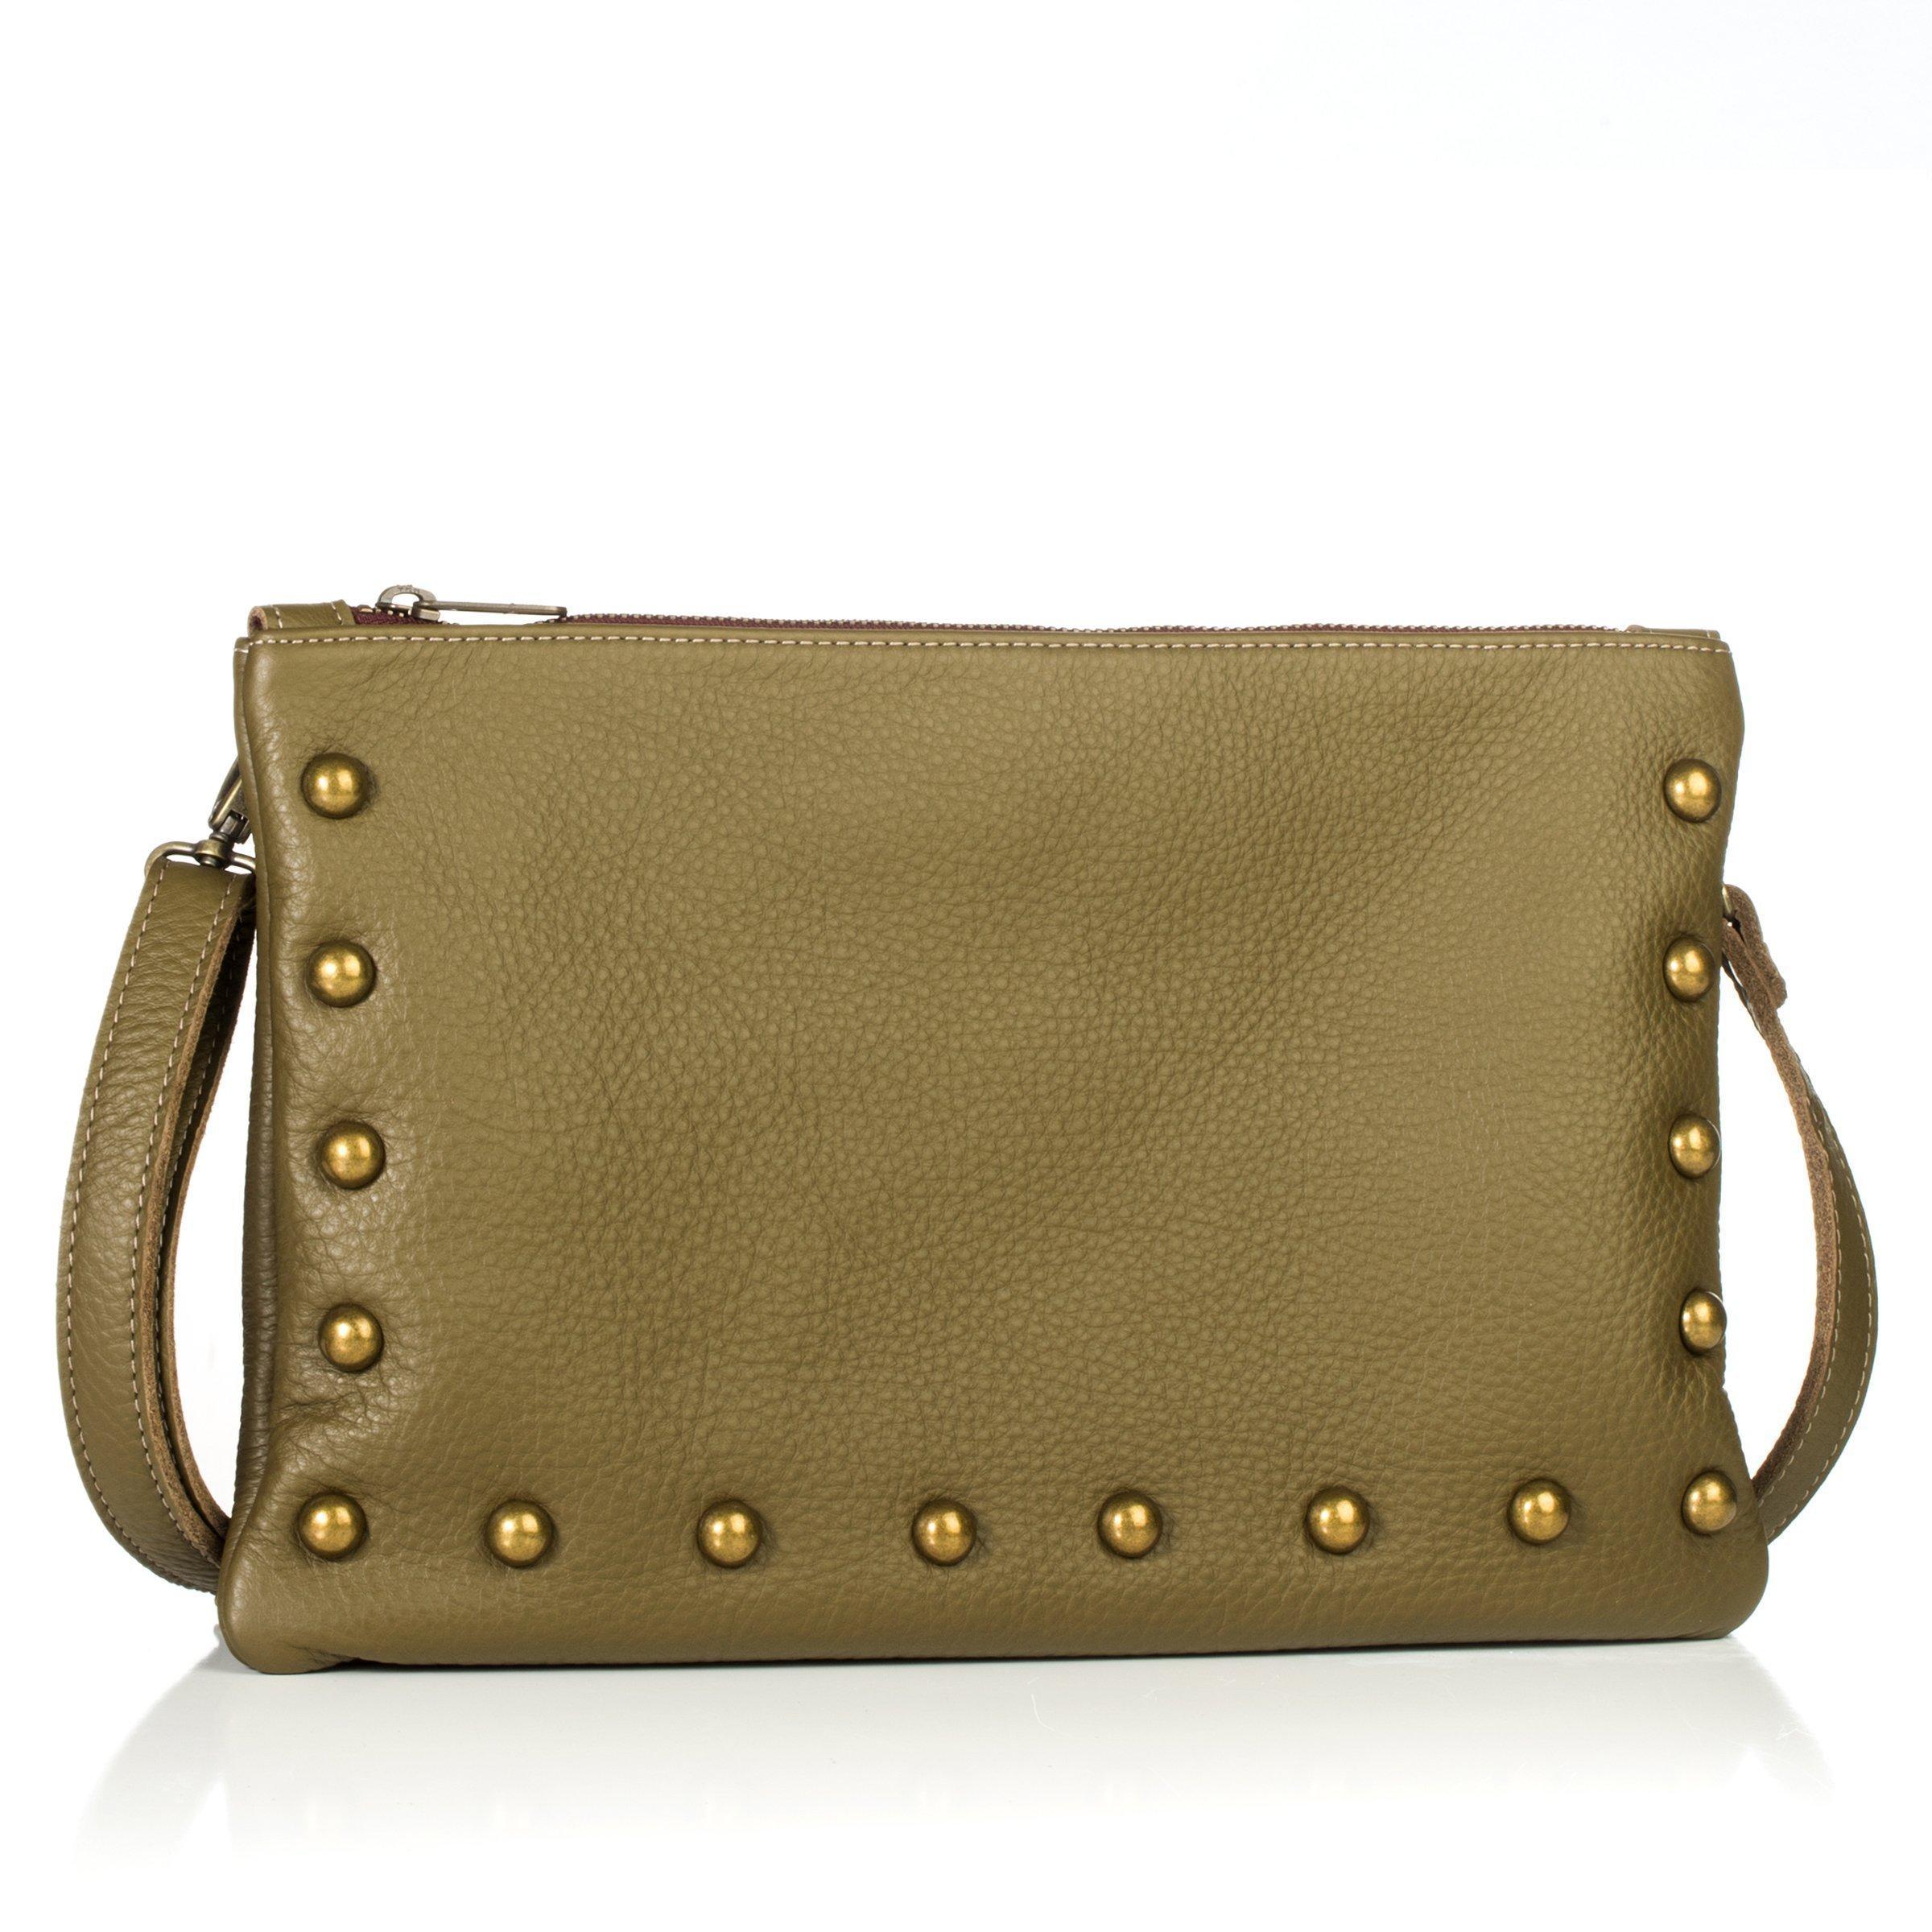 Nikki Medium Sized Crossbody/Clutch in Olive Green Italian Leather